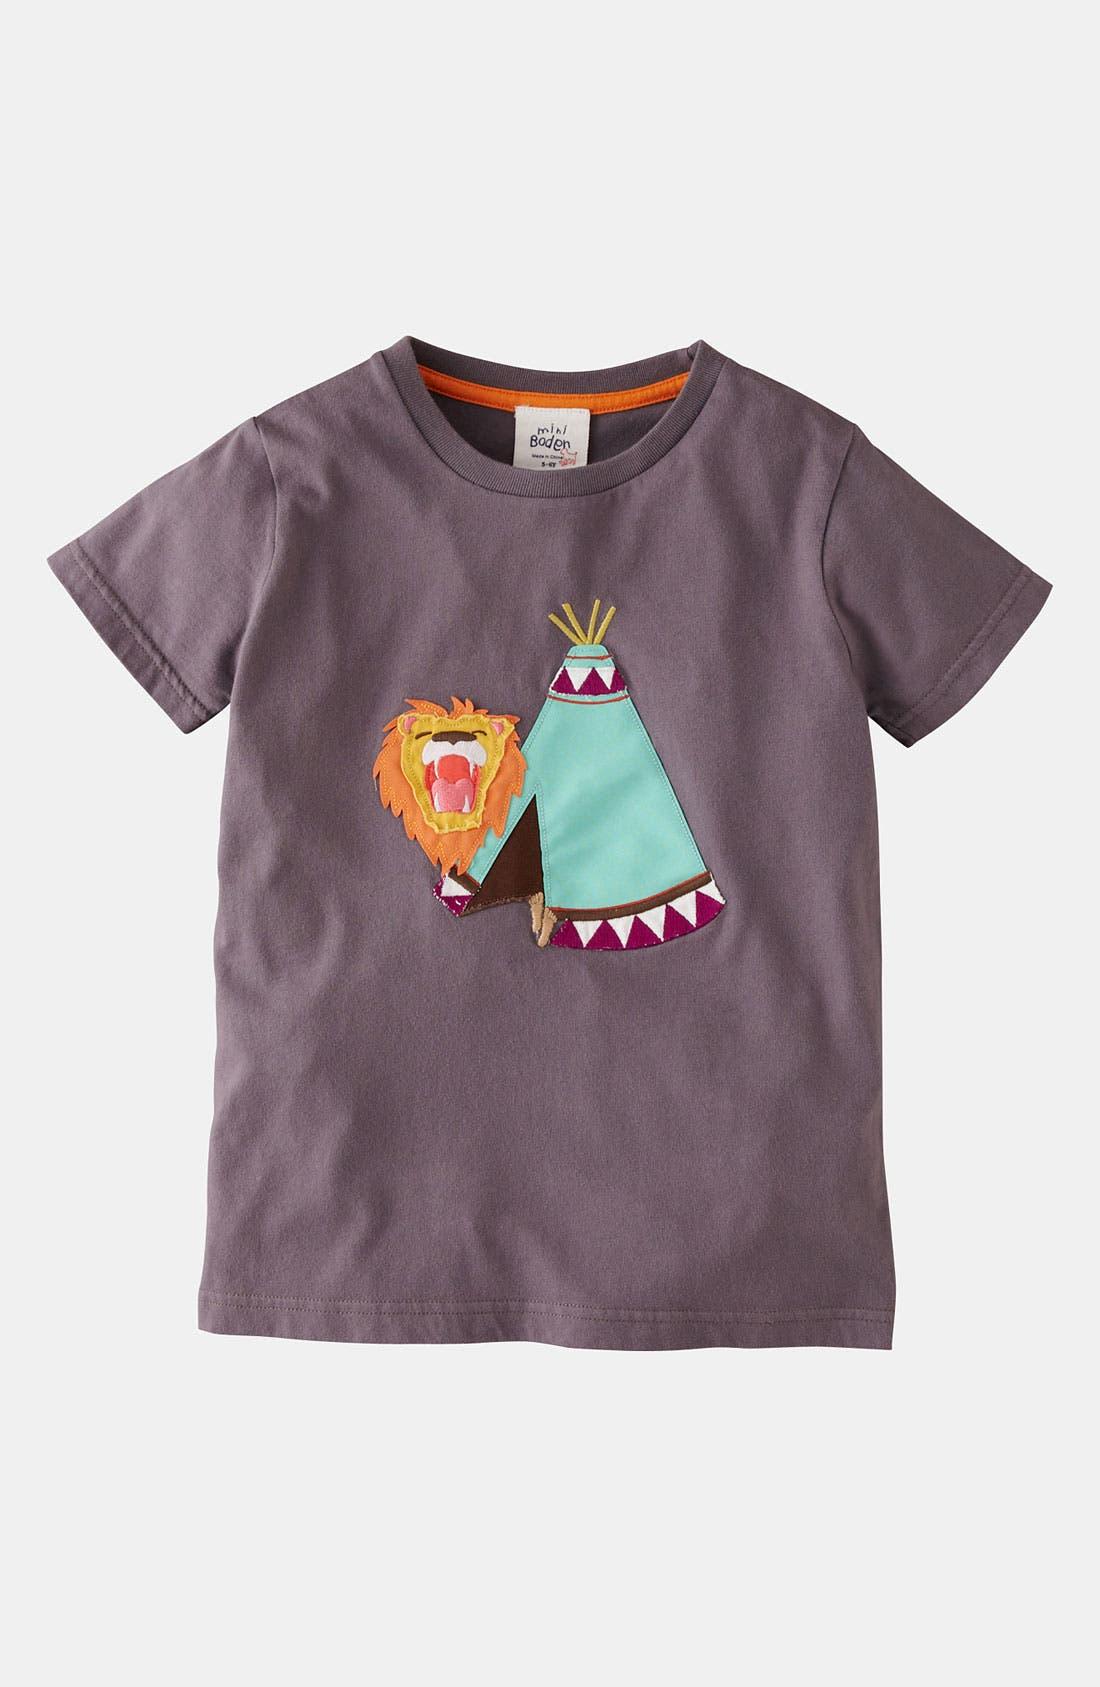 Main Image - Mini Boden 'Adventure Appliqué' T-Shirt (Toddler, Little Boys & Big Boys)